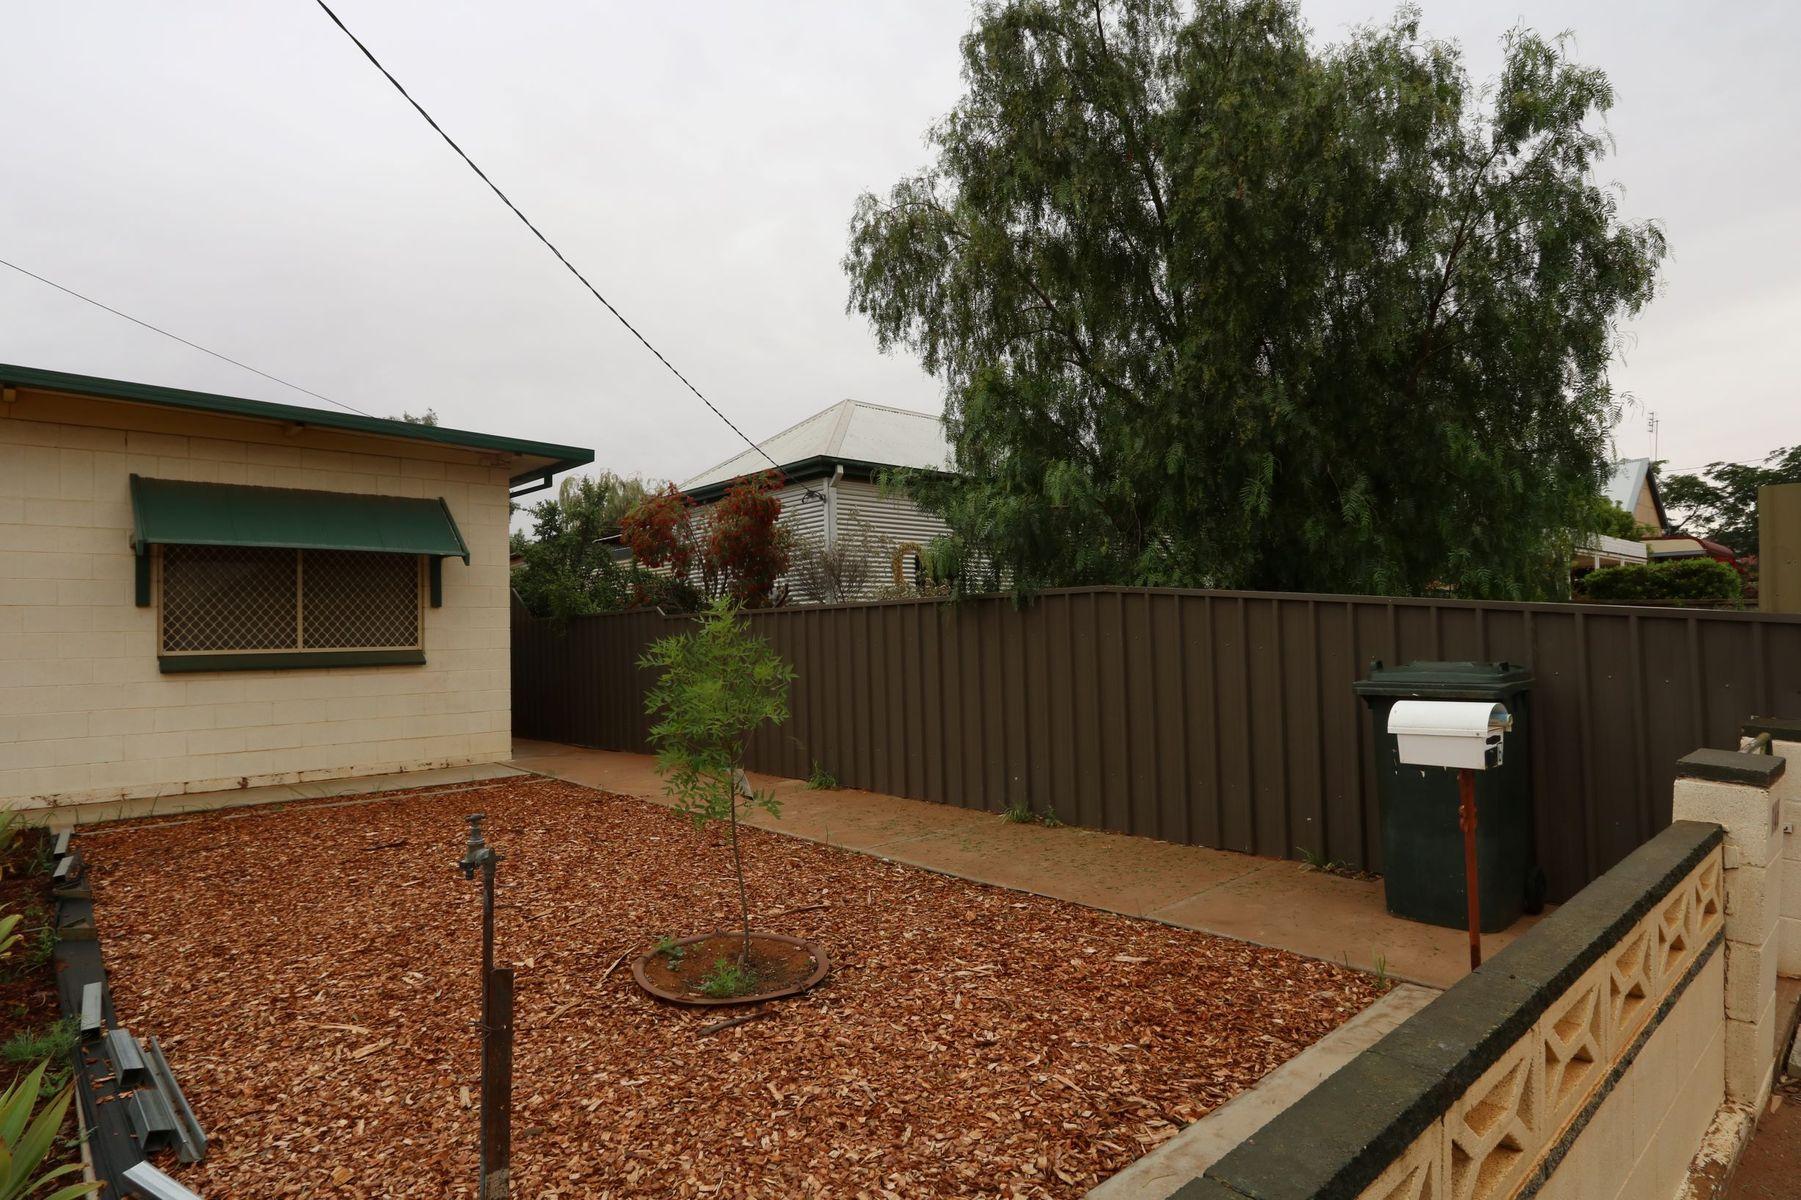 B/146 Ryan, Broken Hill, NSW 2880